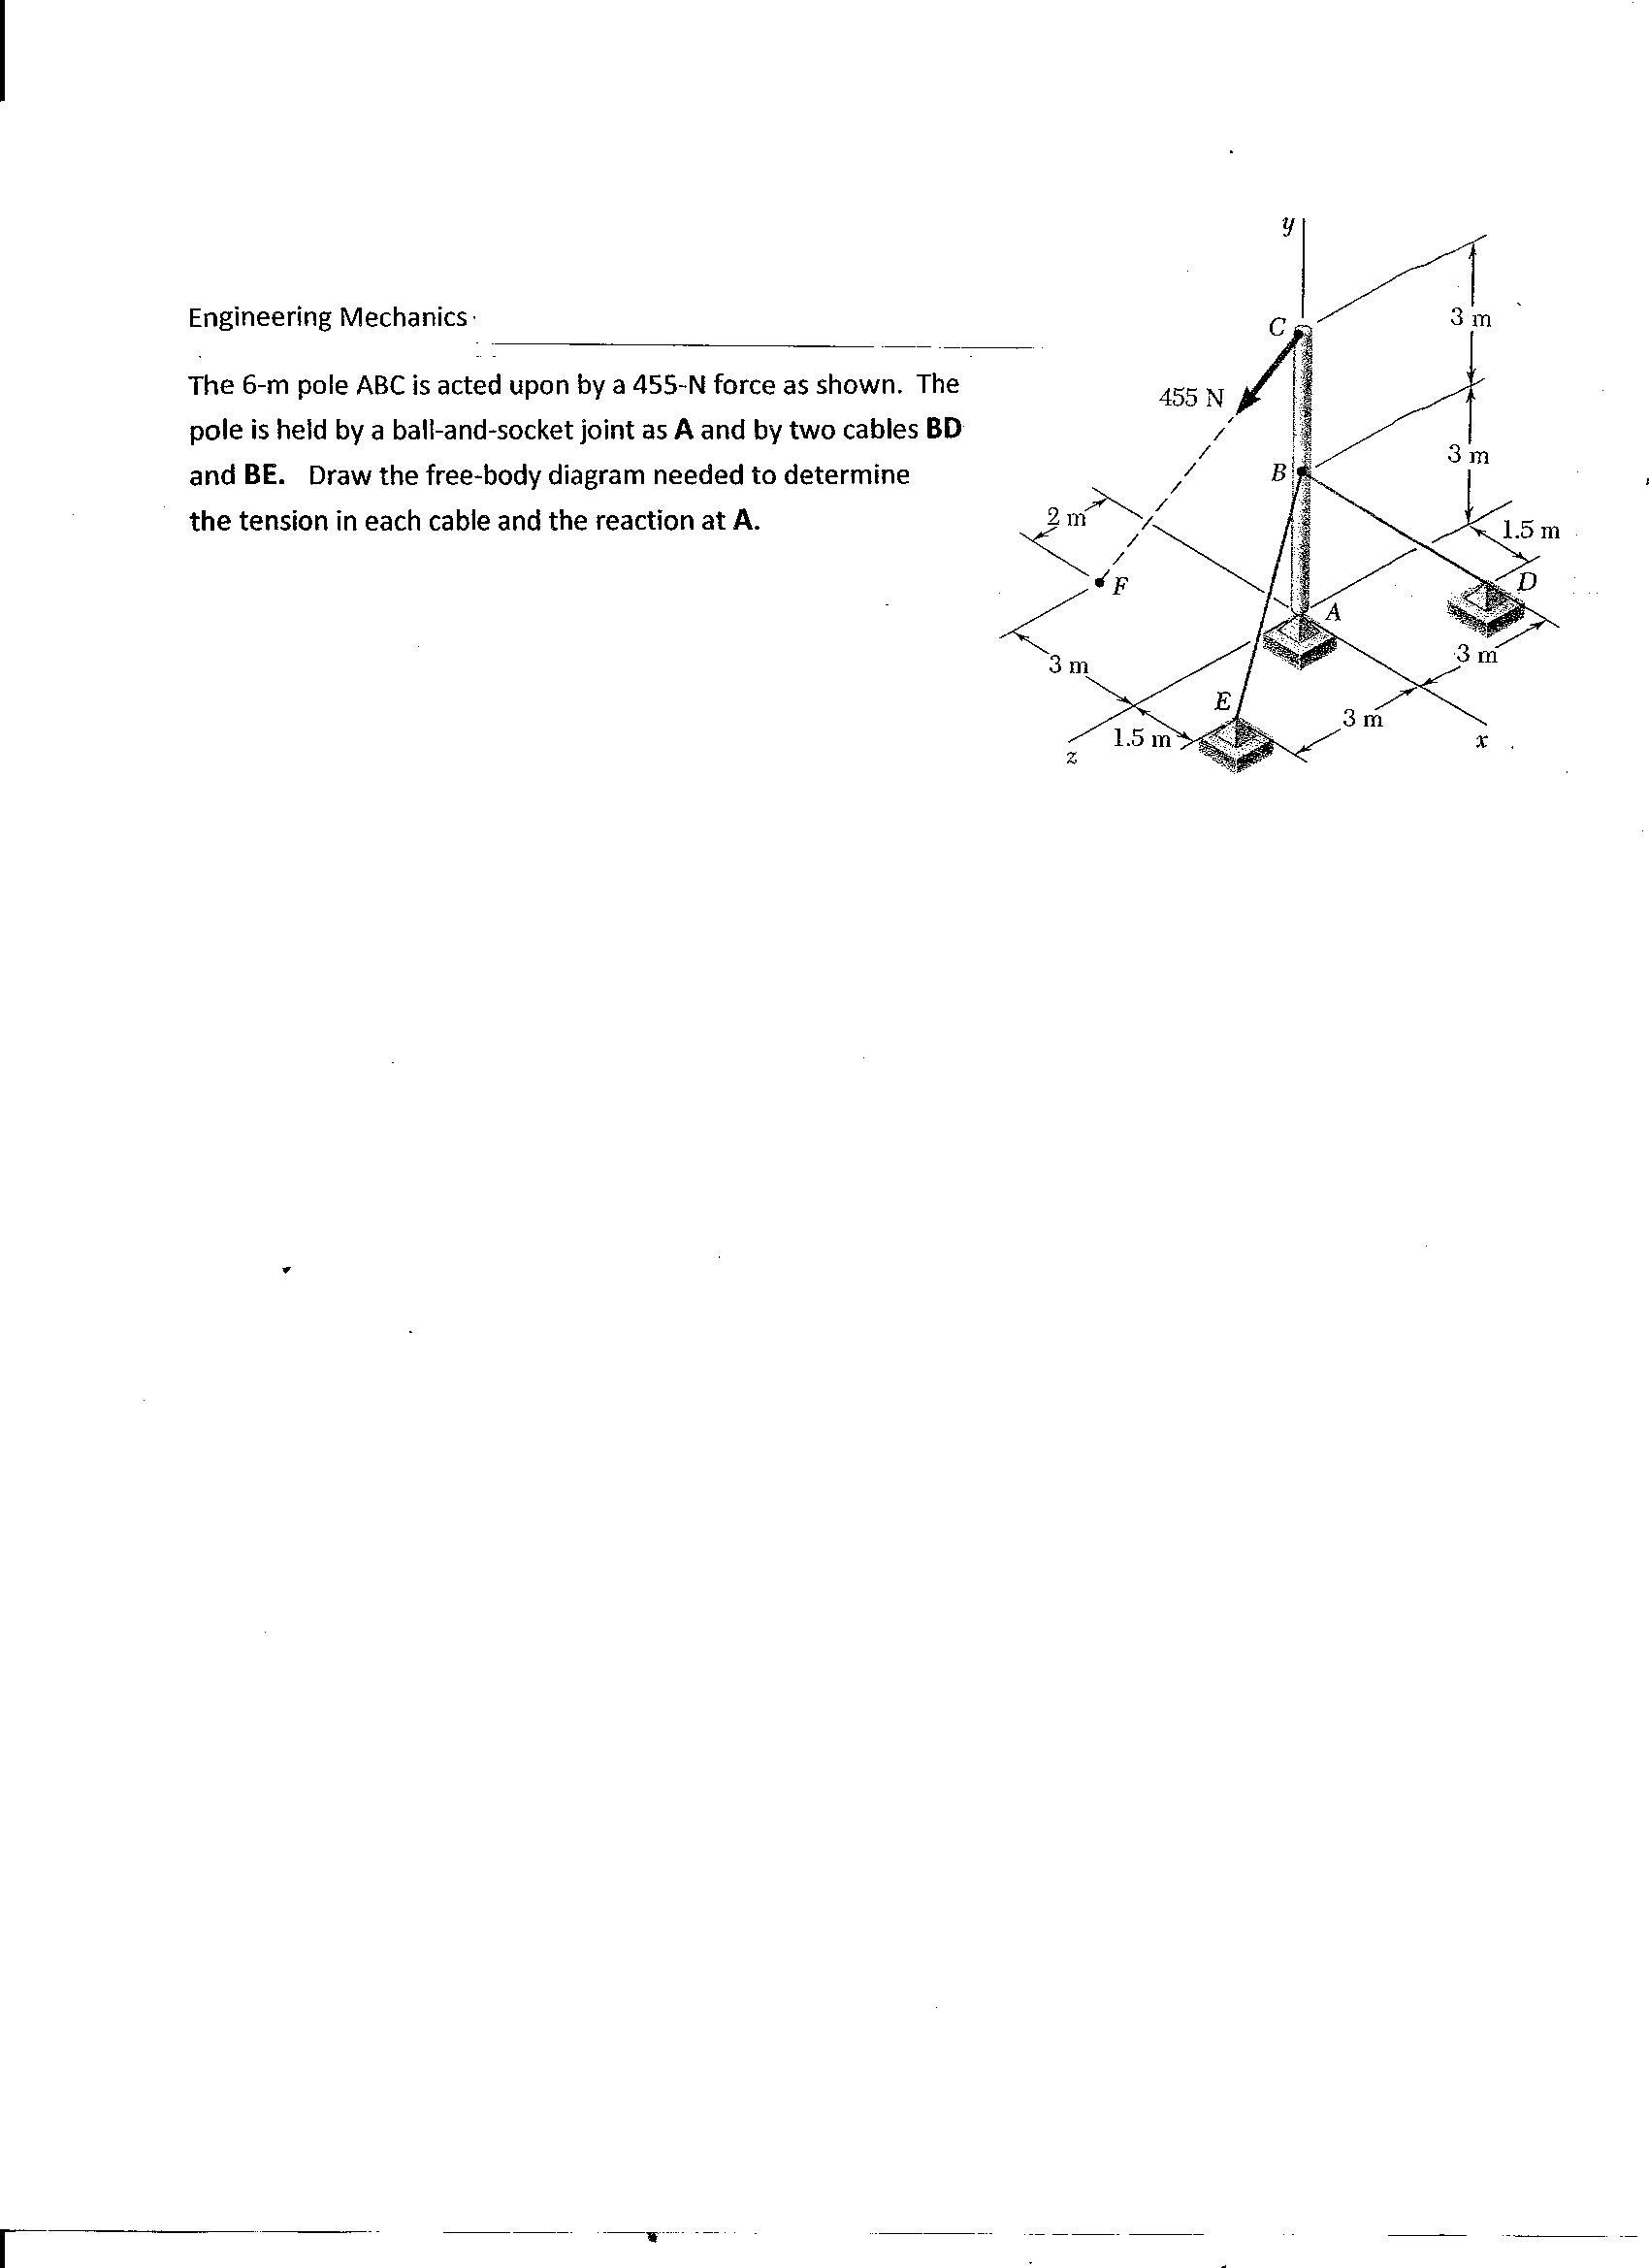 Engineering mechanics the 6 m pole abc is acted up chegg engineering mechanics the 6 m pole abc is acted u pooptronica